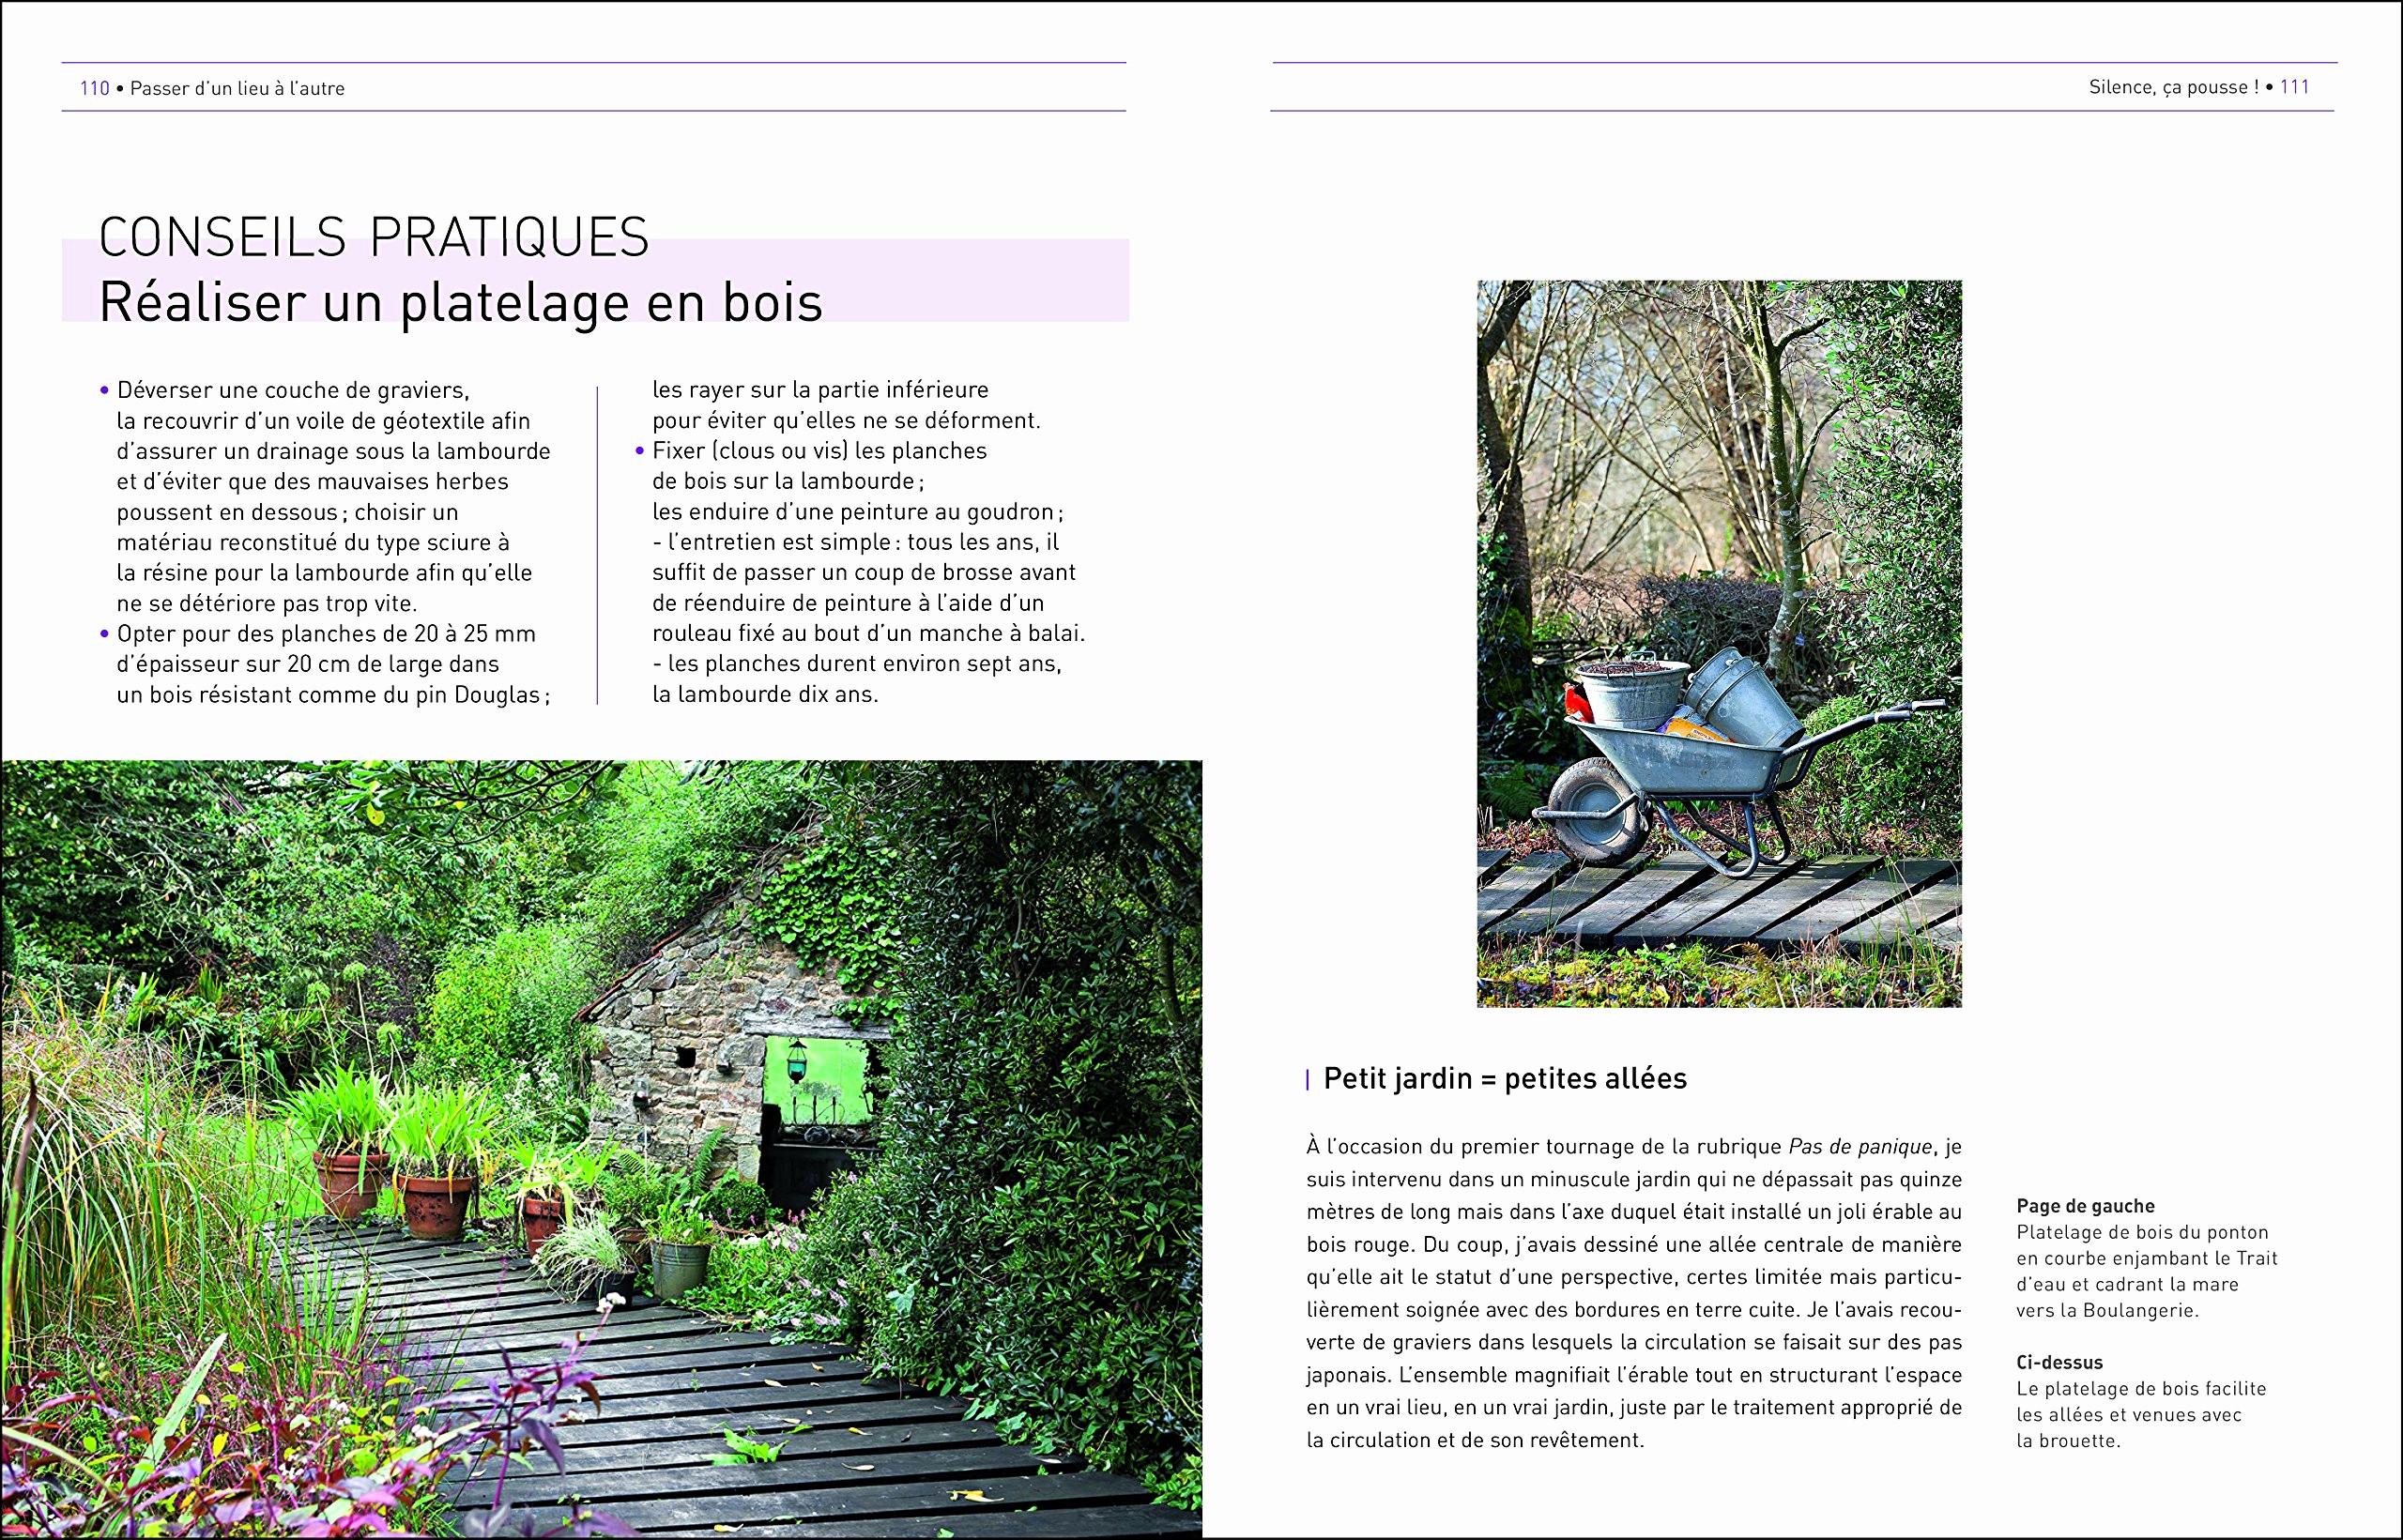 Monaco Salon De Jardin Meilleur De Photos Salon De Jardin Monaco Plus Fascinant Jardin Monaco Awesome Cloture